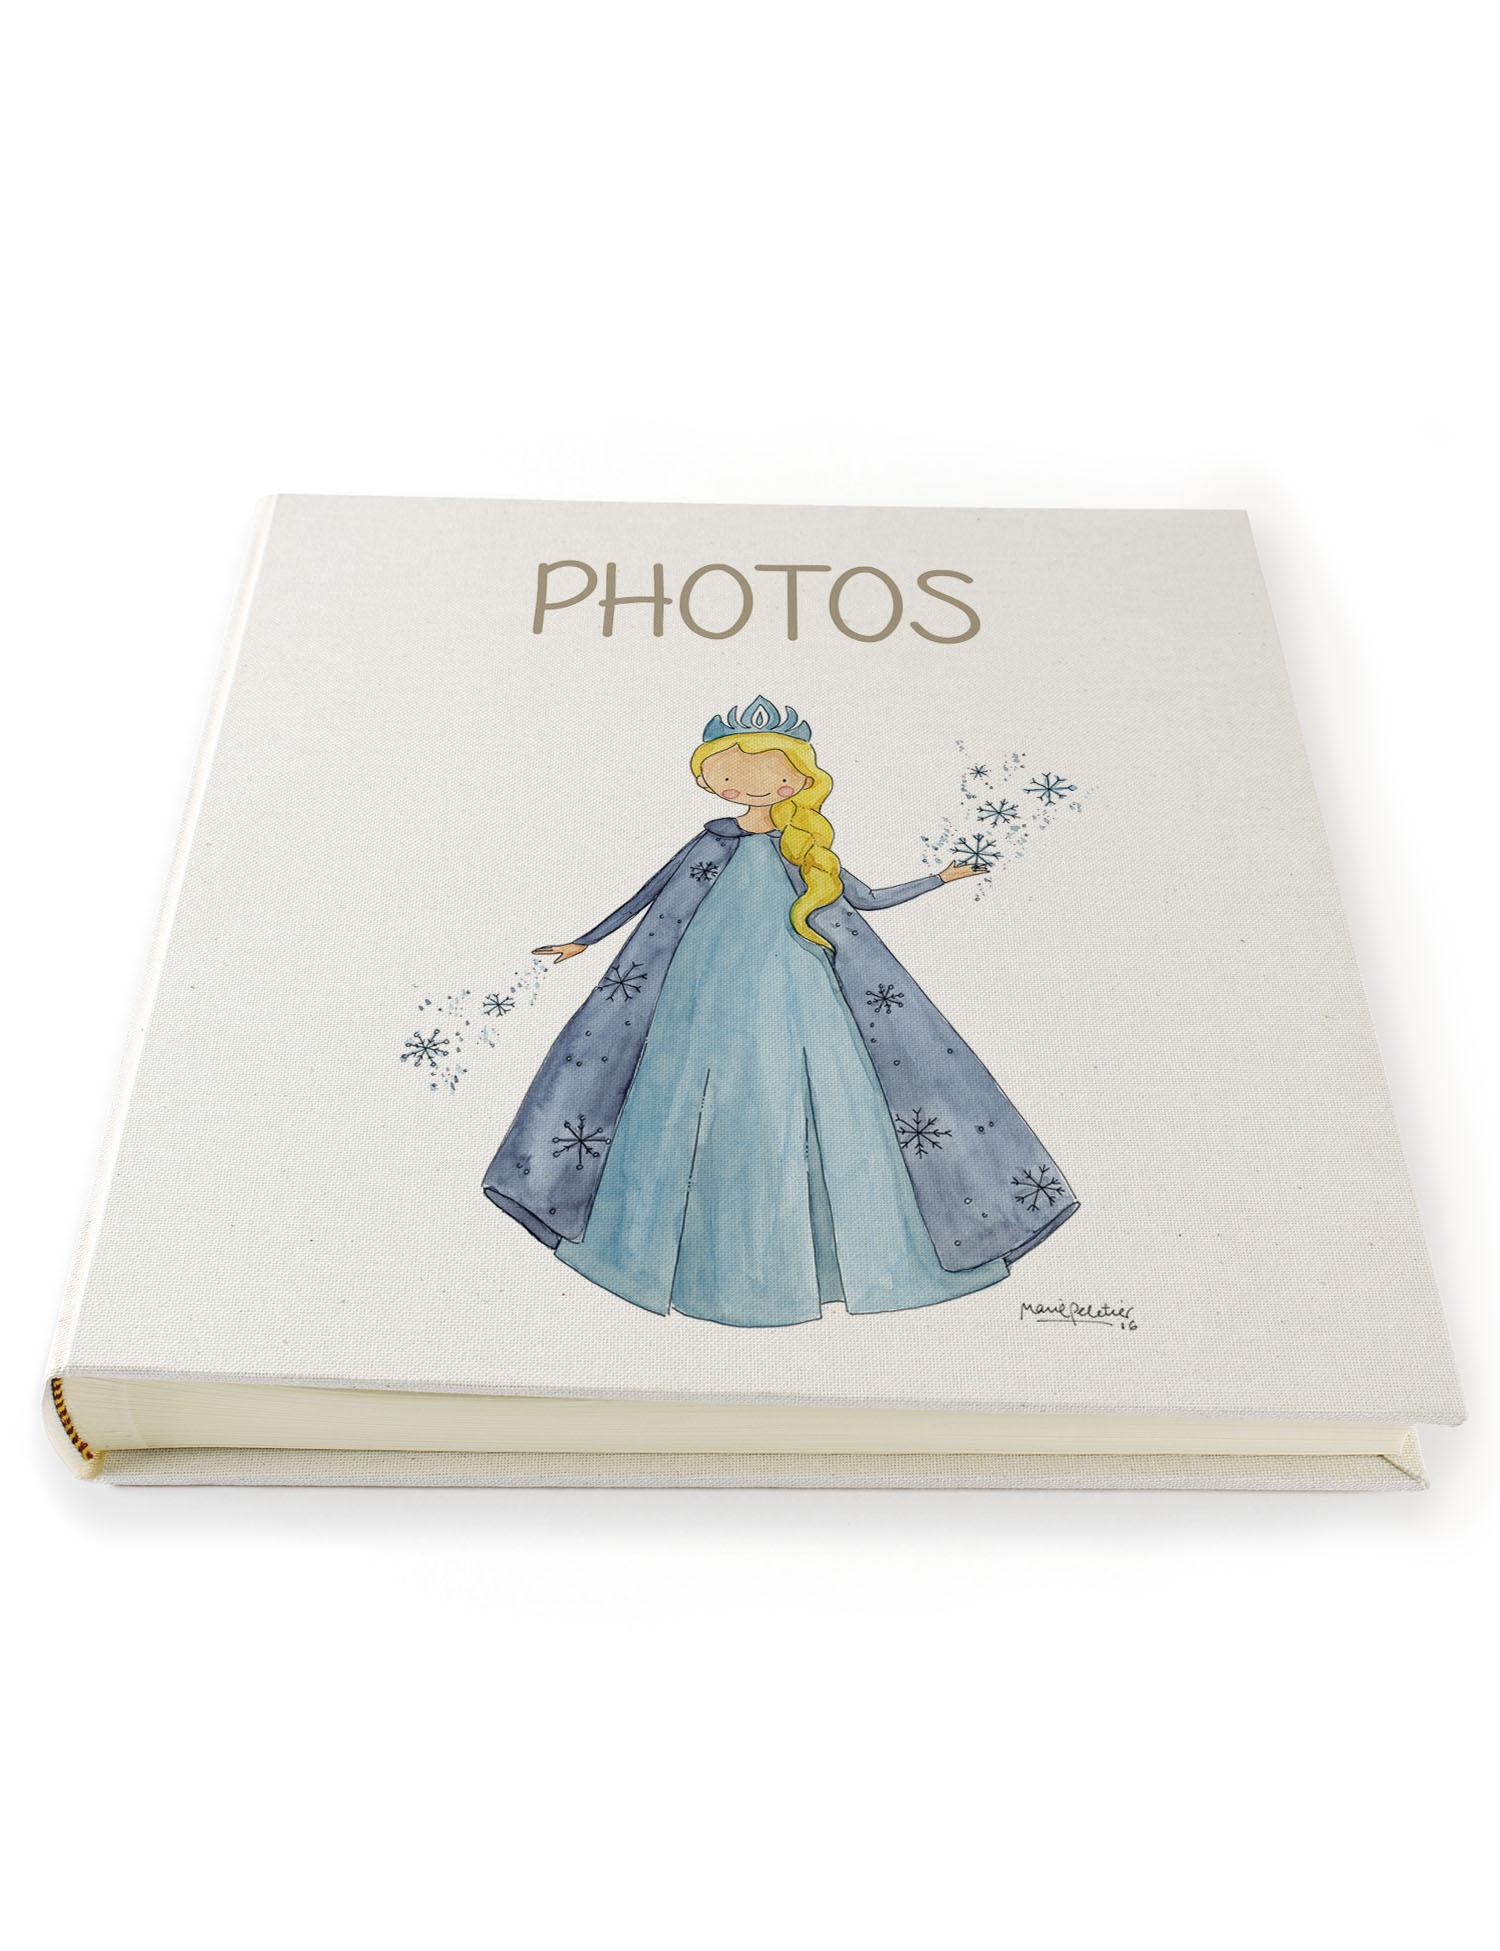 ALBUM FOZEN min - Album Princesas Frozen